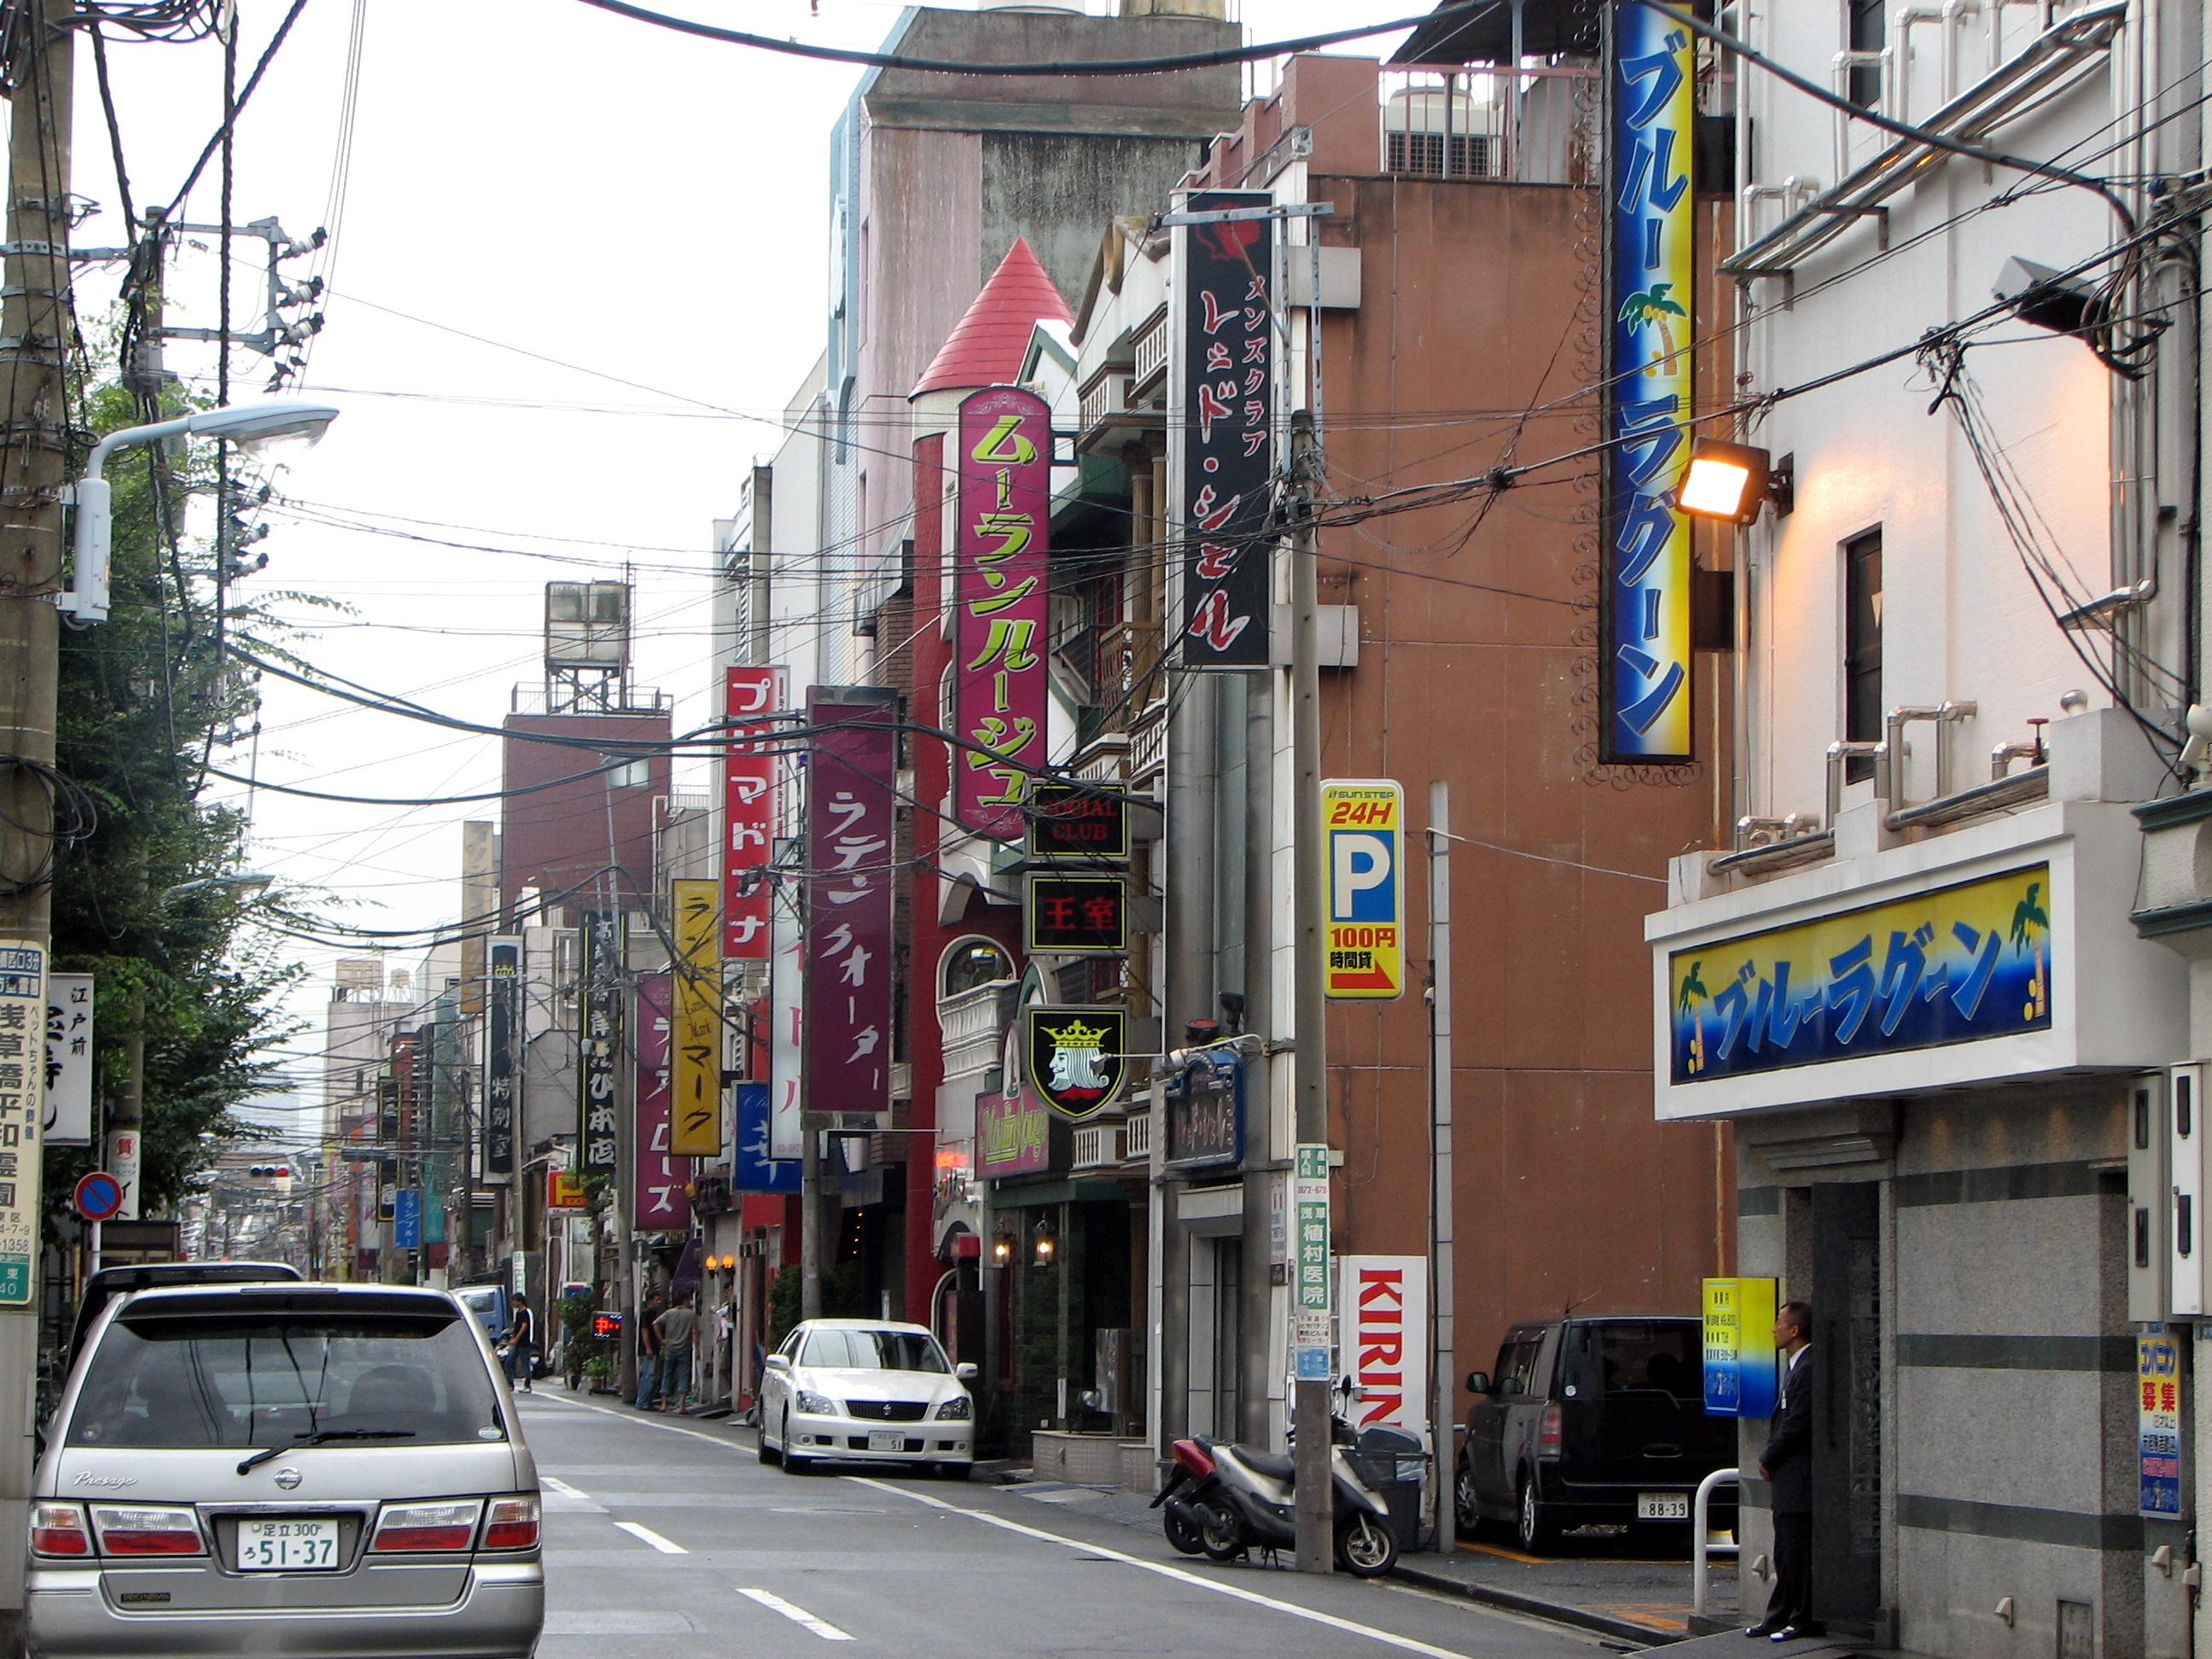 https://upload.wikimedia.org/wikipedia/commons/c/c9/Modern_Yoshiwara_Tokyo.jpg